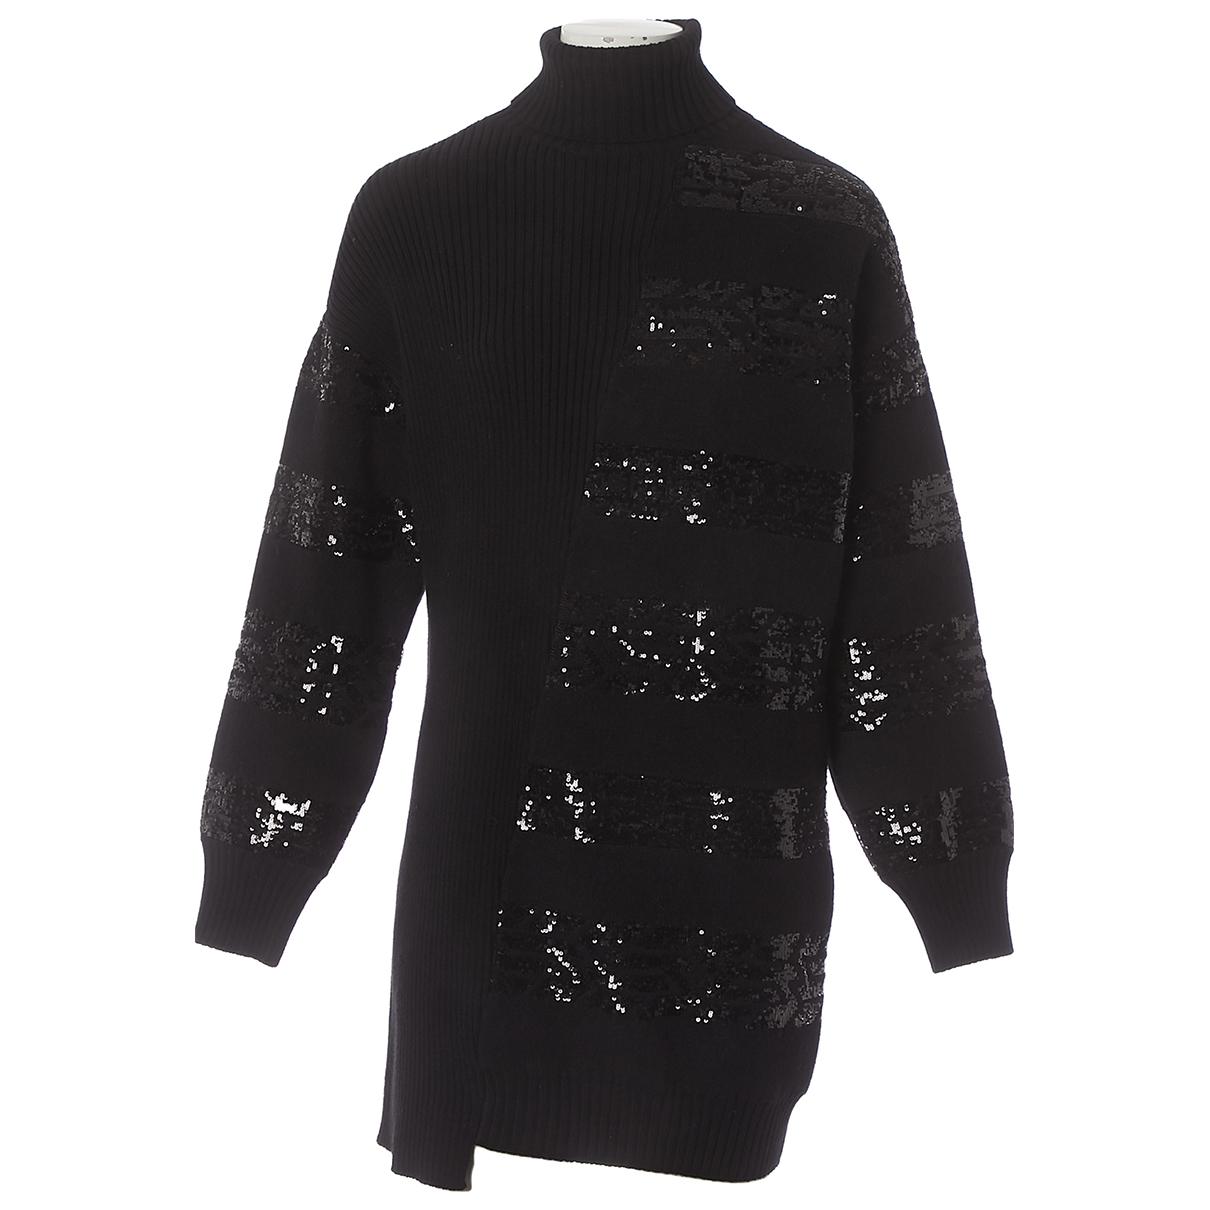 Louis Vuitton N Black Wool dress for Women M International